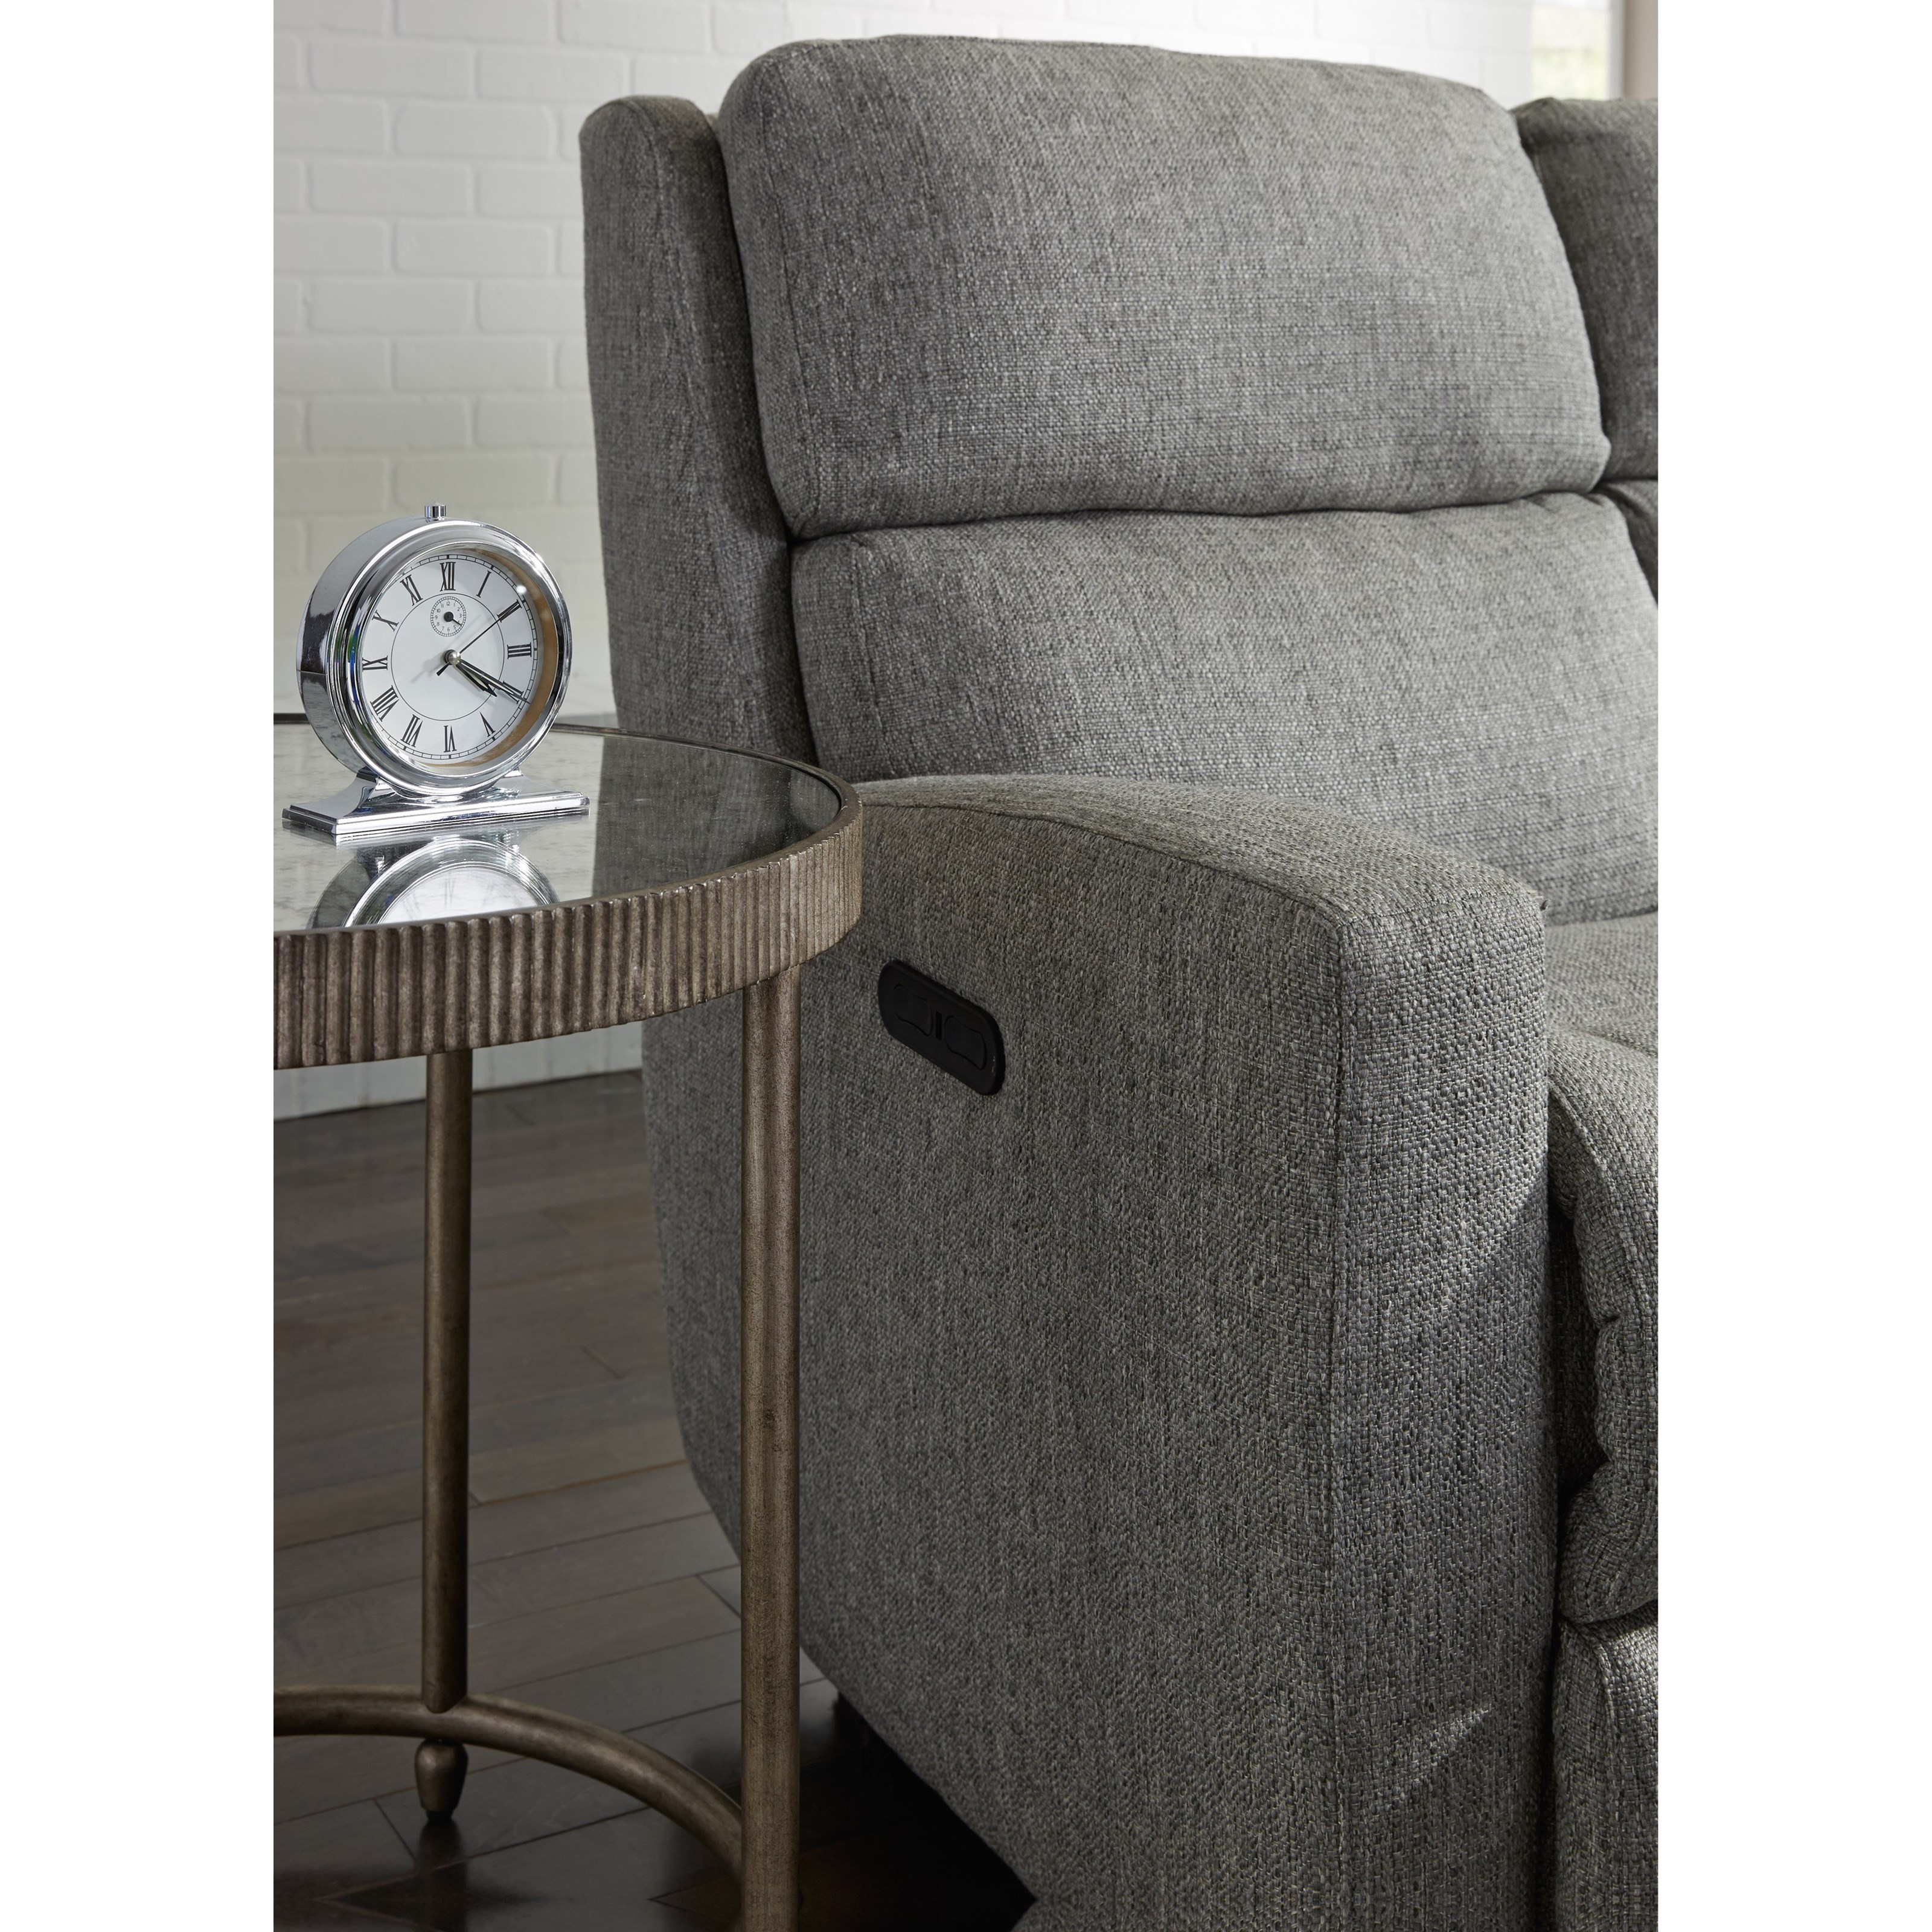 Flexsteel catalina four piece power reclining sectional for 4 piece recliner sectional sofa